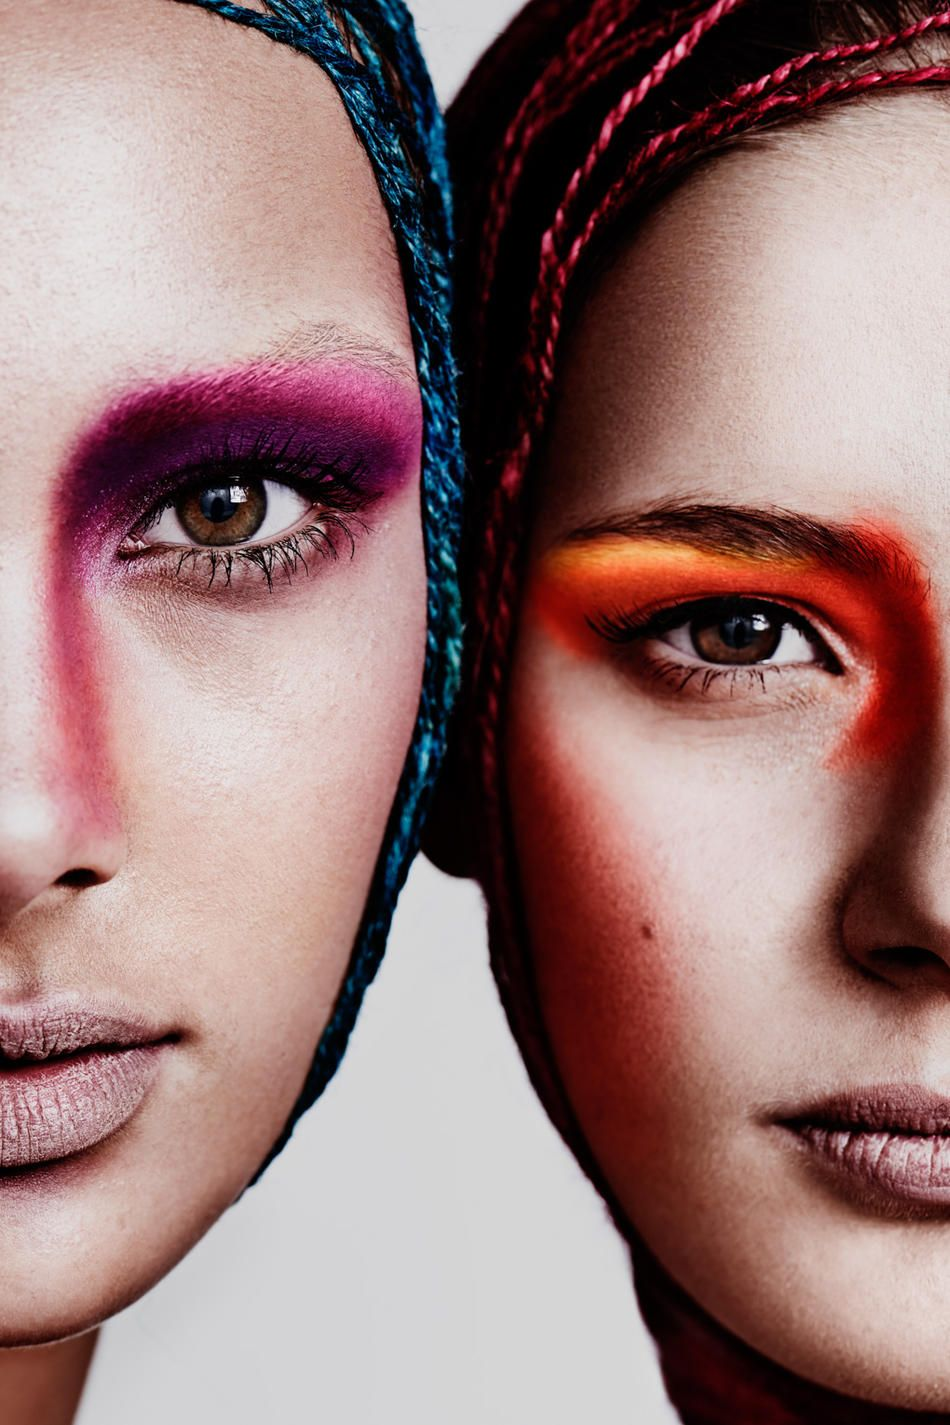 """SOFT GLOW' Photographer jimmy_says_namaste Makeup"